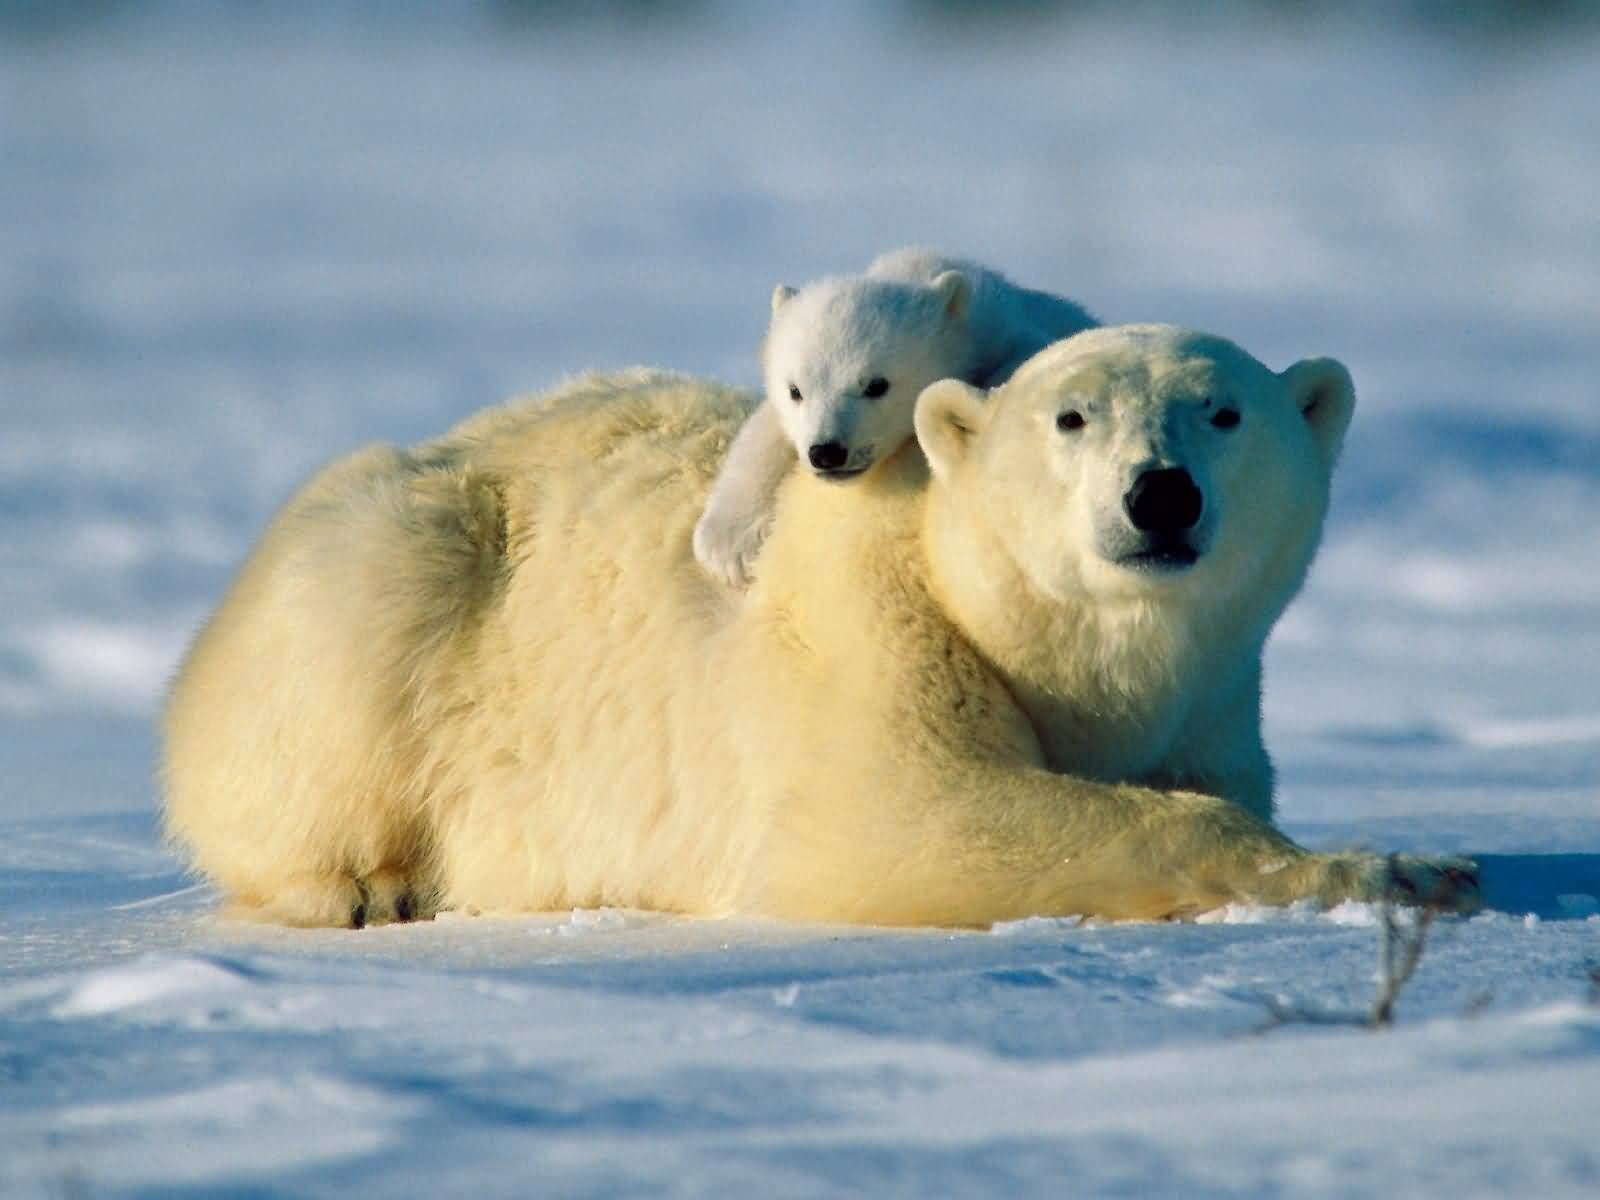 Baby Bear Hug Polar Bear Wallpaper Polar Bear Facts Baby Polar Bears Animal polar bears on ice wallpapers hd